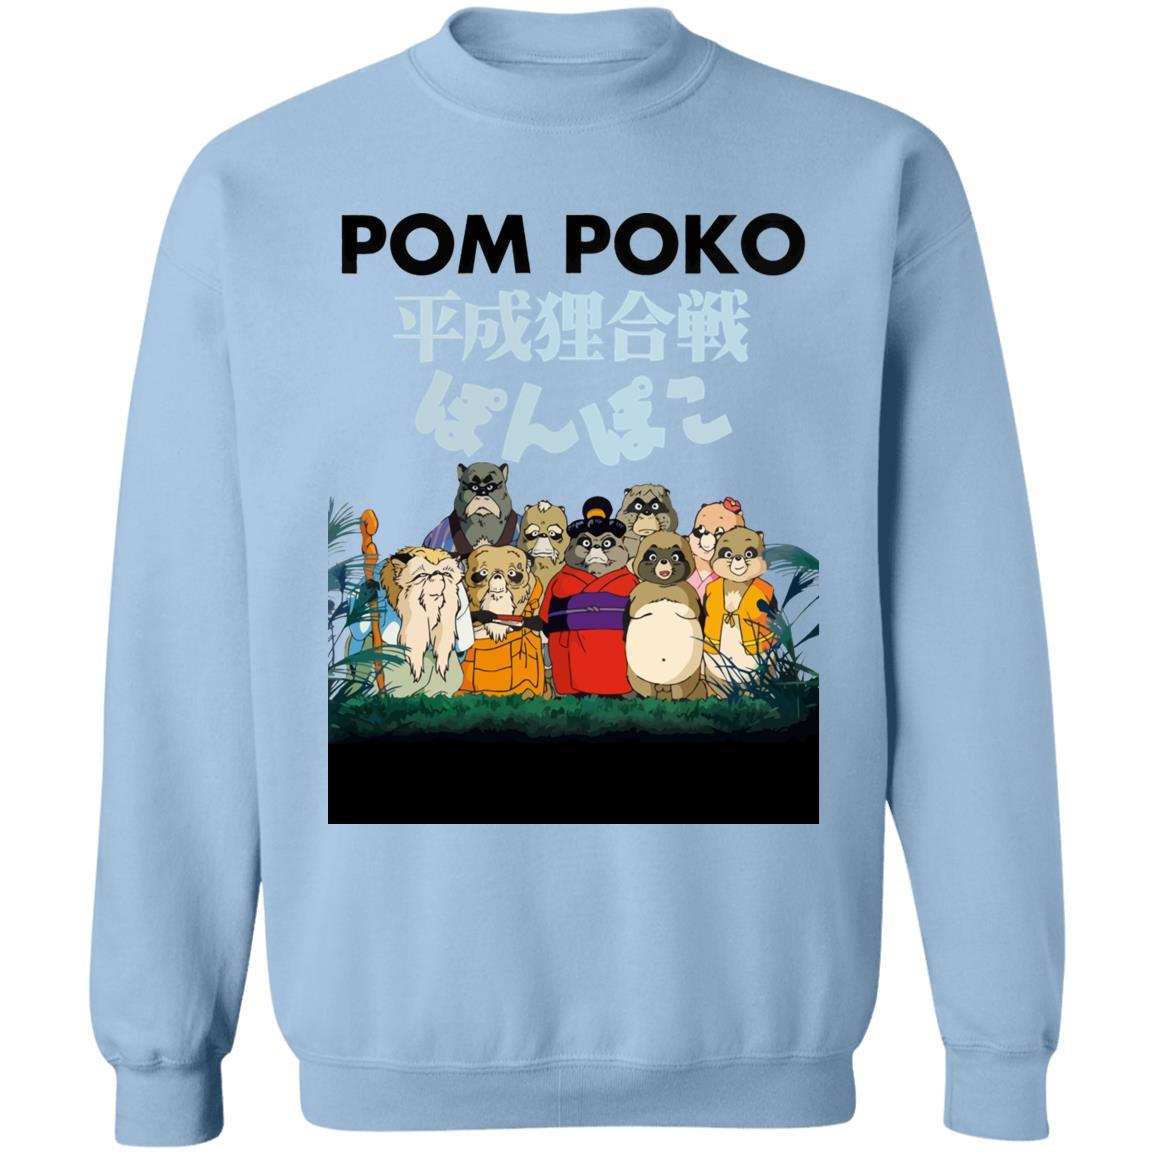 Pom Poko Poster Japanese Sweatshirt